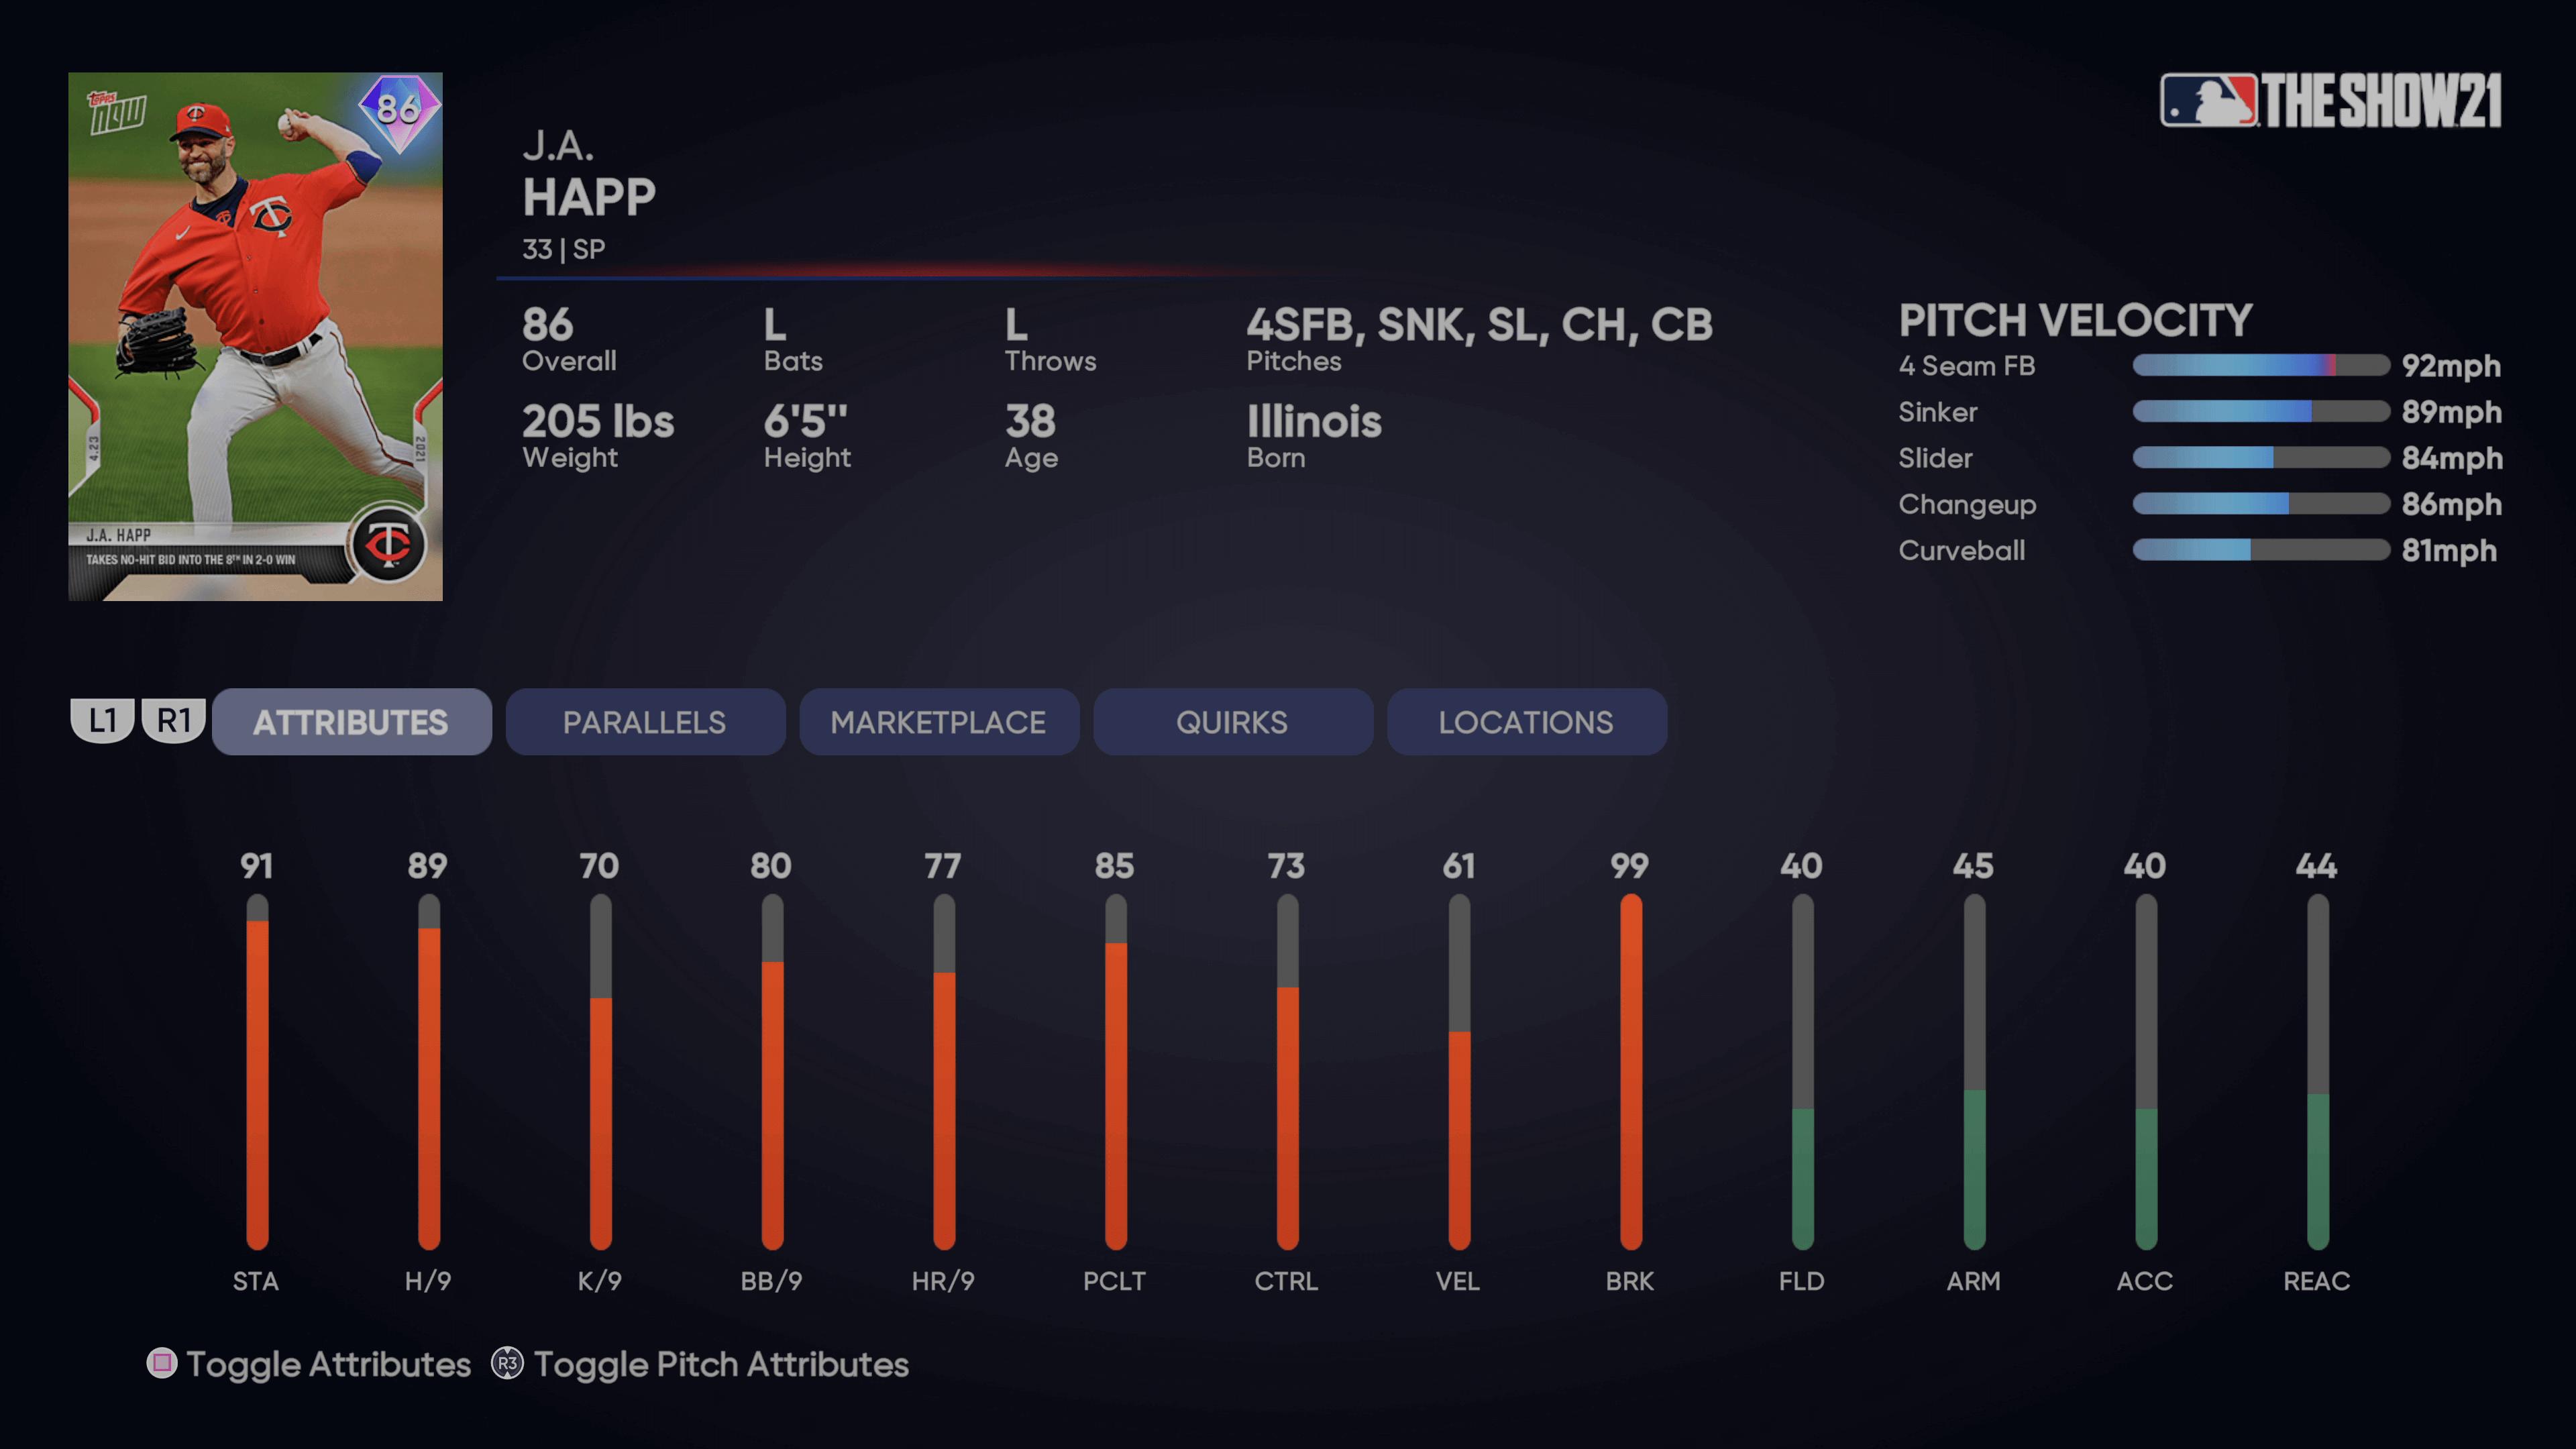 MLB The Show 21 - Topps Now Happ